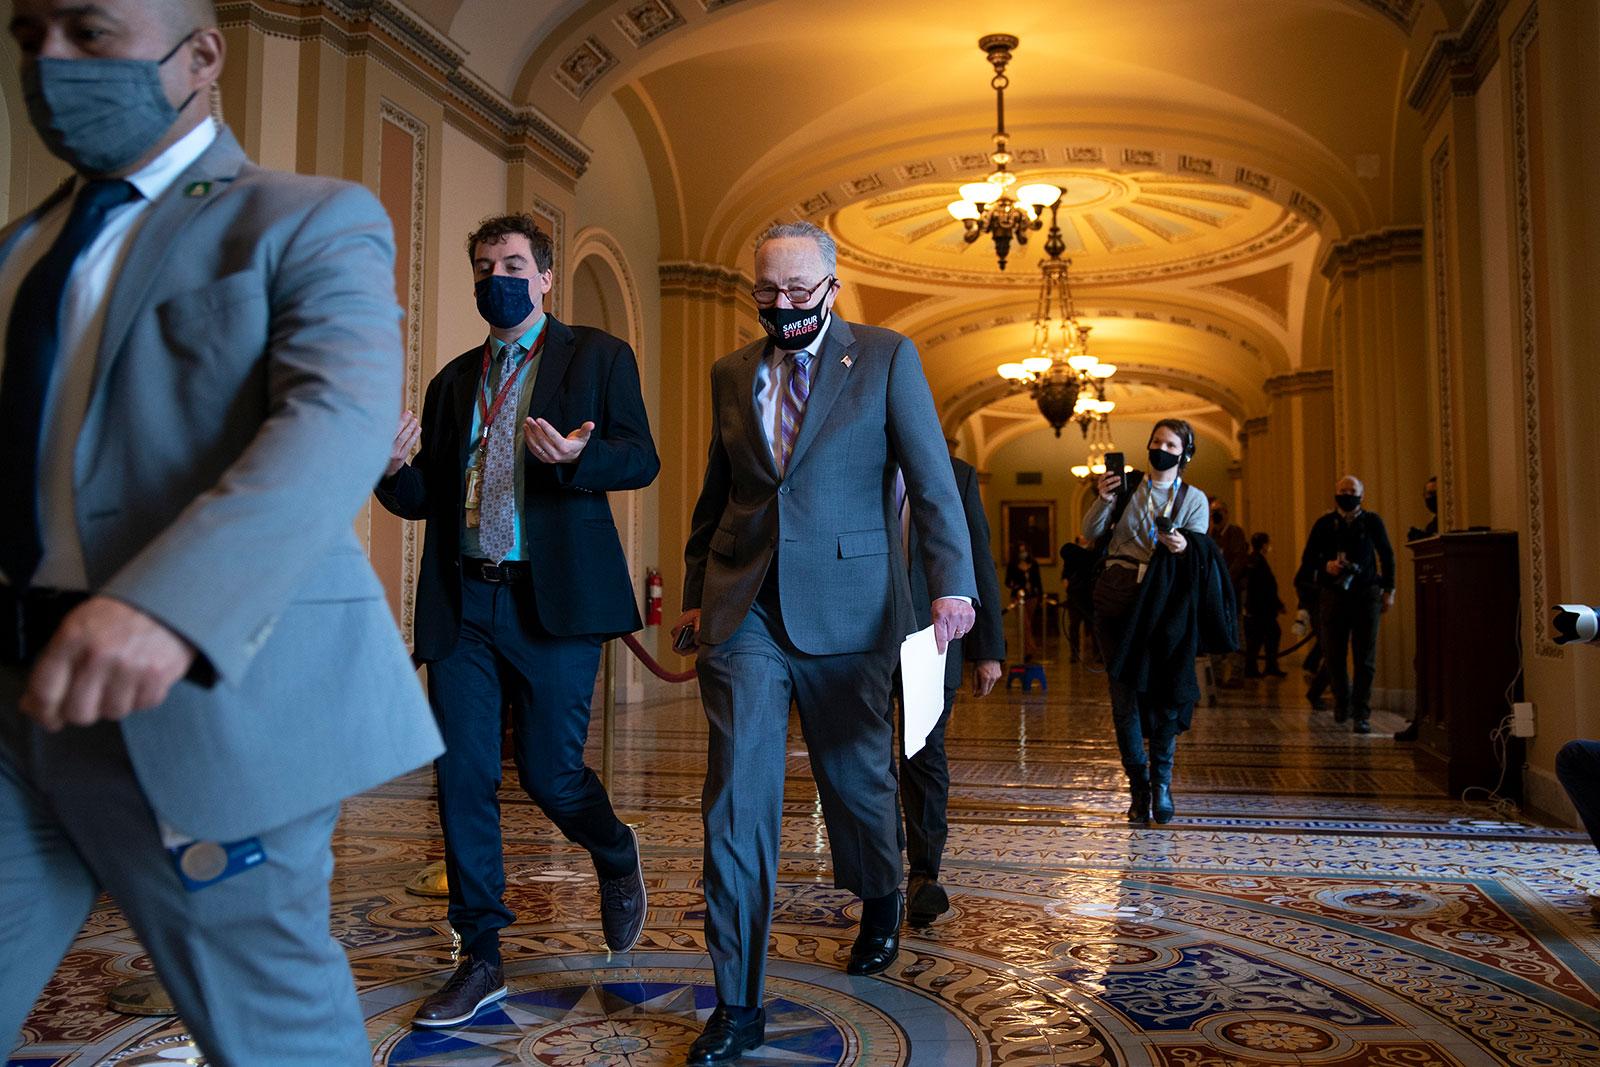 Senate Majority Leader Chuck Schumer walks through the Capitol on Tuesday.